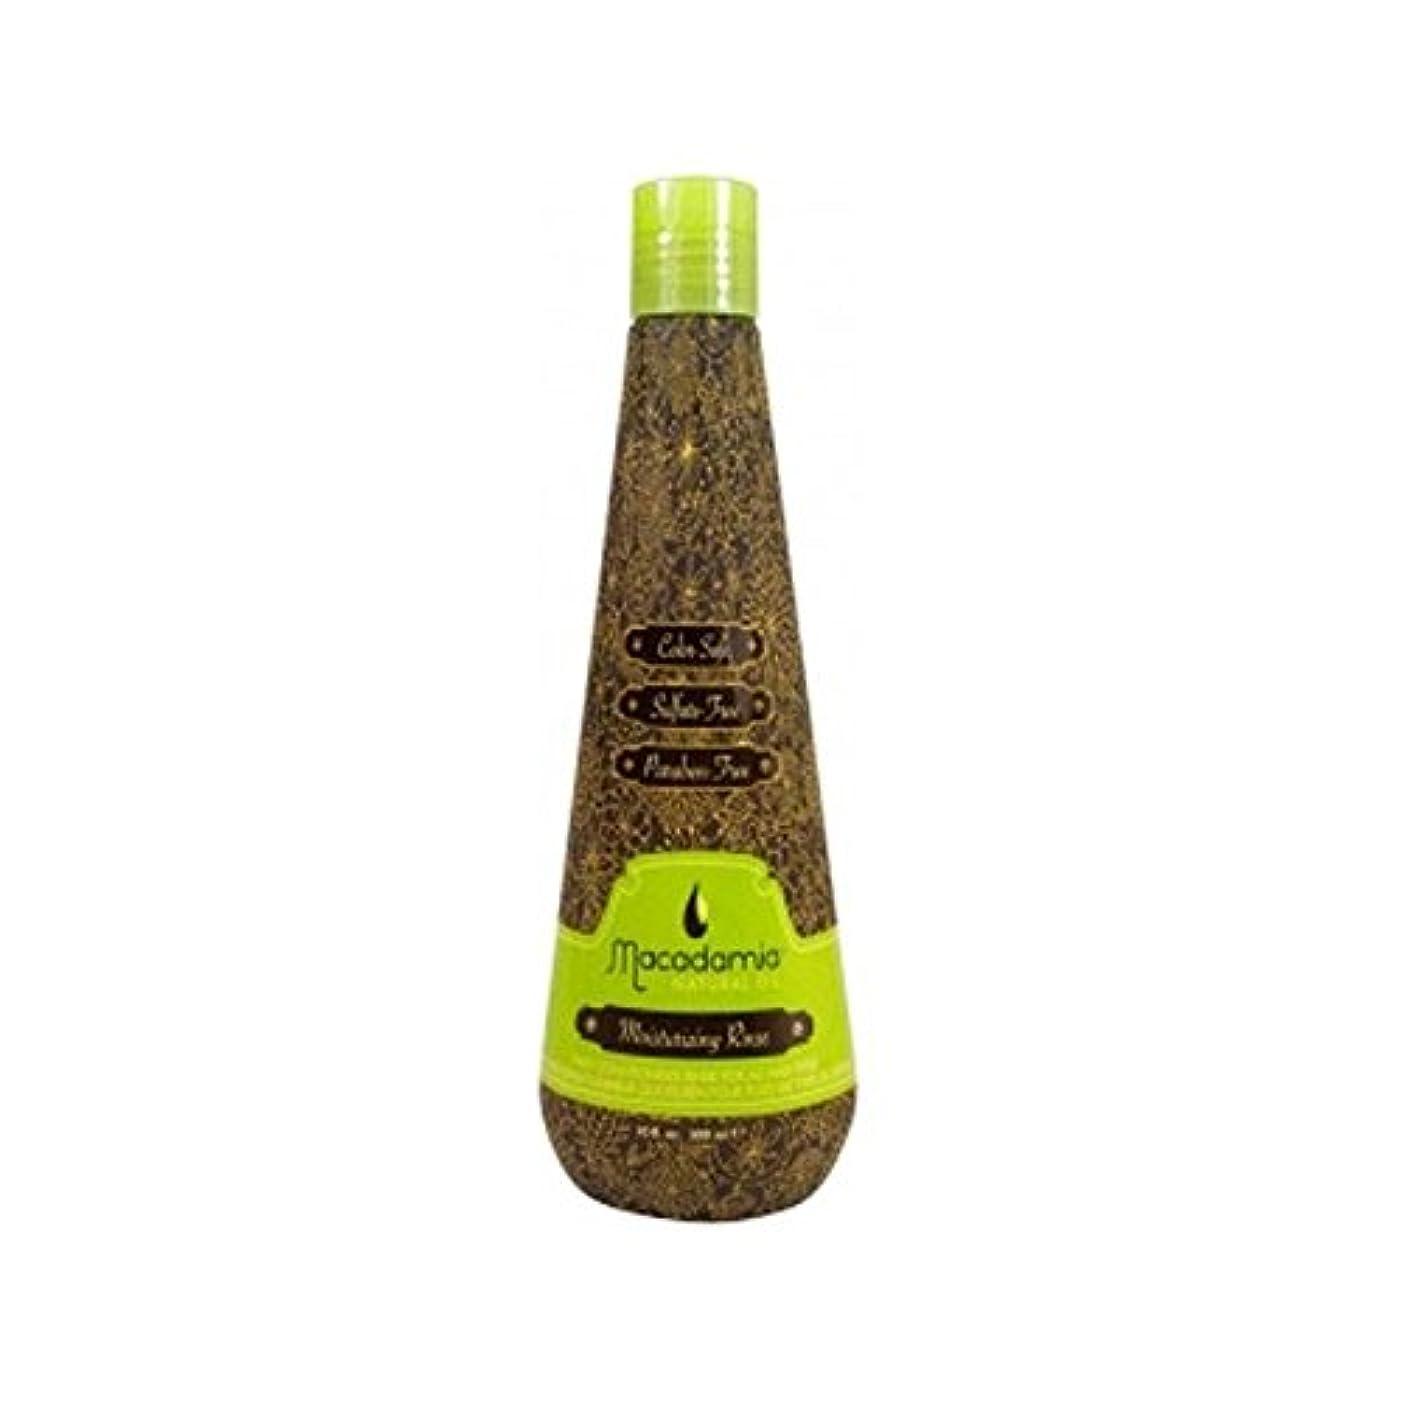 Macadamia Moisturising Rinse (300ml) (Pack of 6) - マカダミア保湿リンス(300ミリリットル) x6 [並行輸入品]